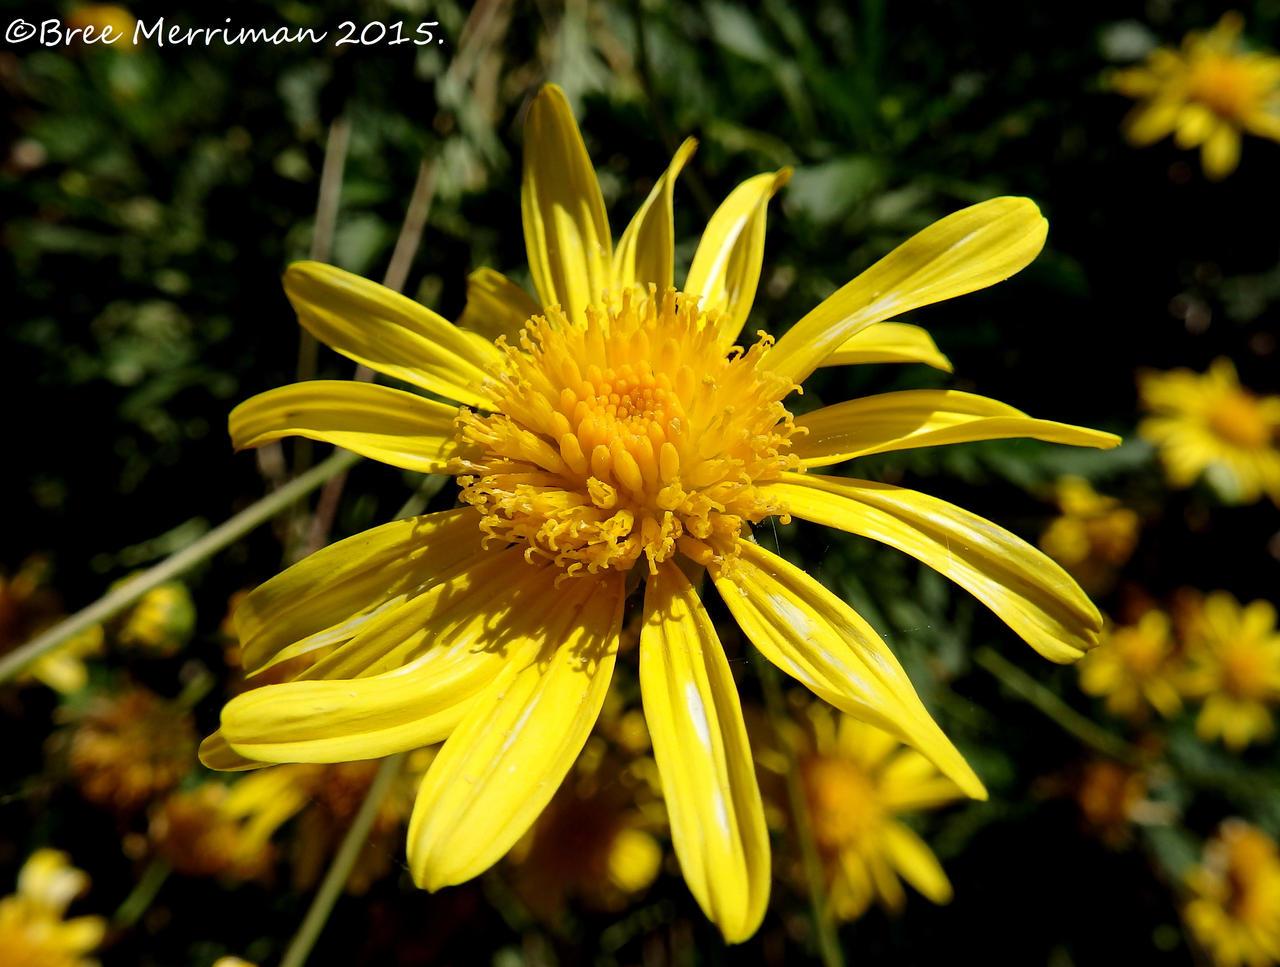 Yellow Daisy Flower II by BreeSpawn